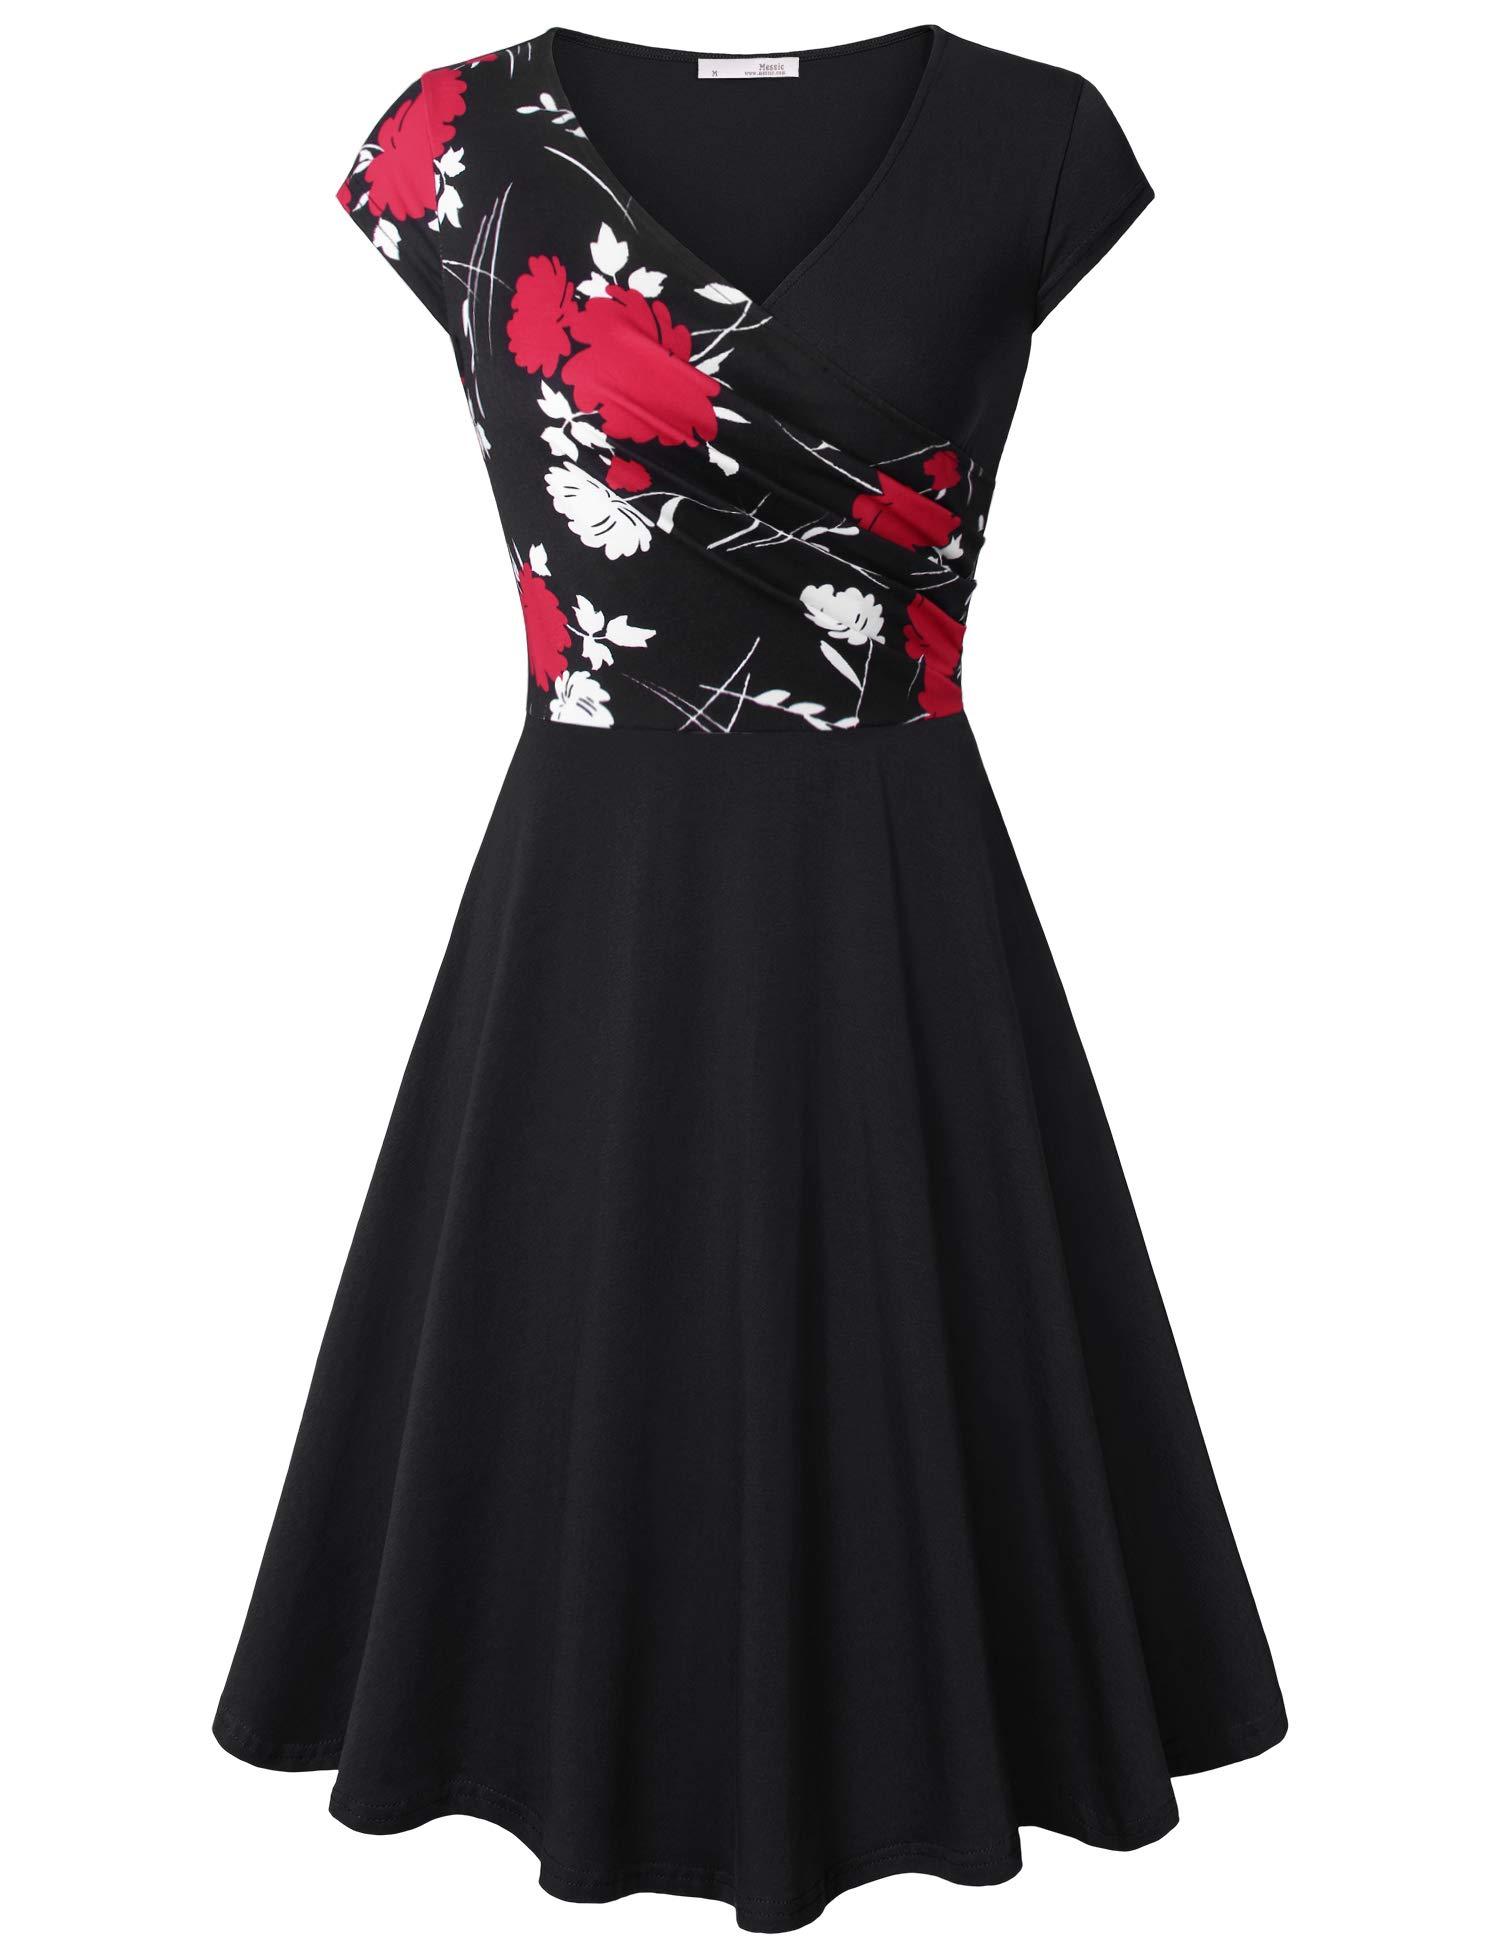 Messic Direct Tea Dress for Womens Women's Cross V Neck Dresses Cap Sleeve Elegant Flared A Line Dress Black Red XX-Large